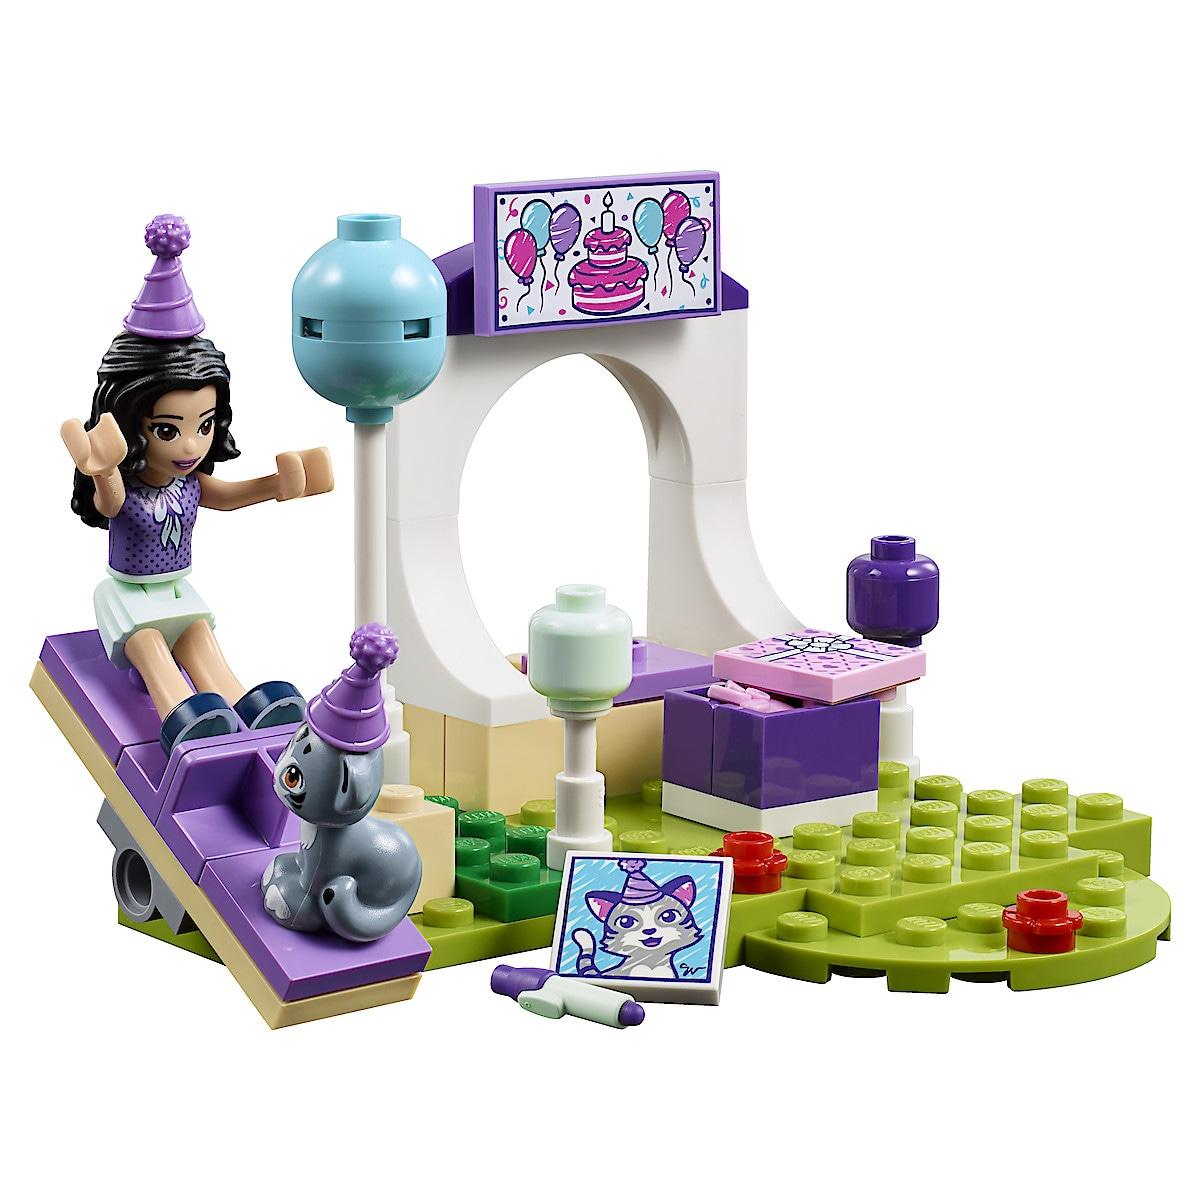 LEGO Juniors Friends 10748, Emmas husdjursparty